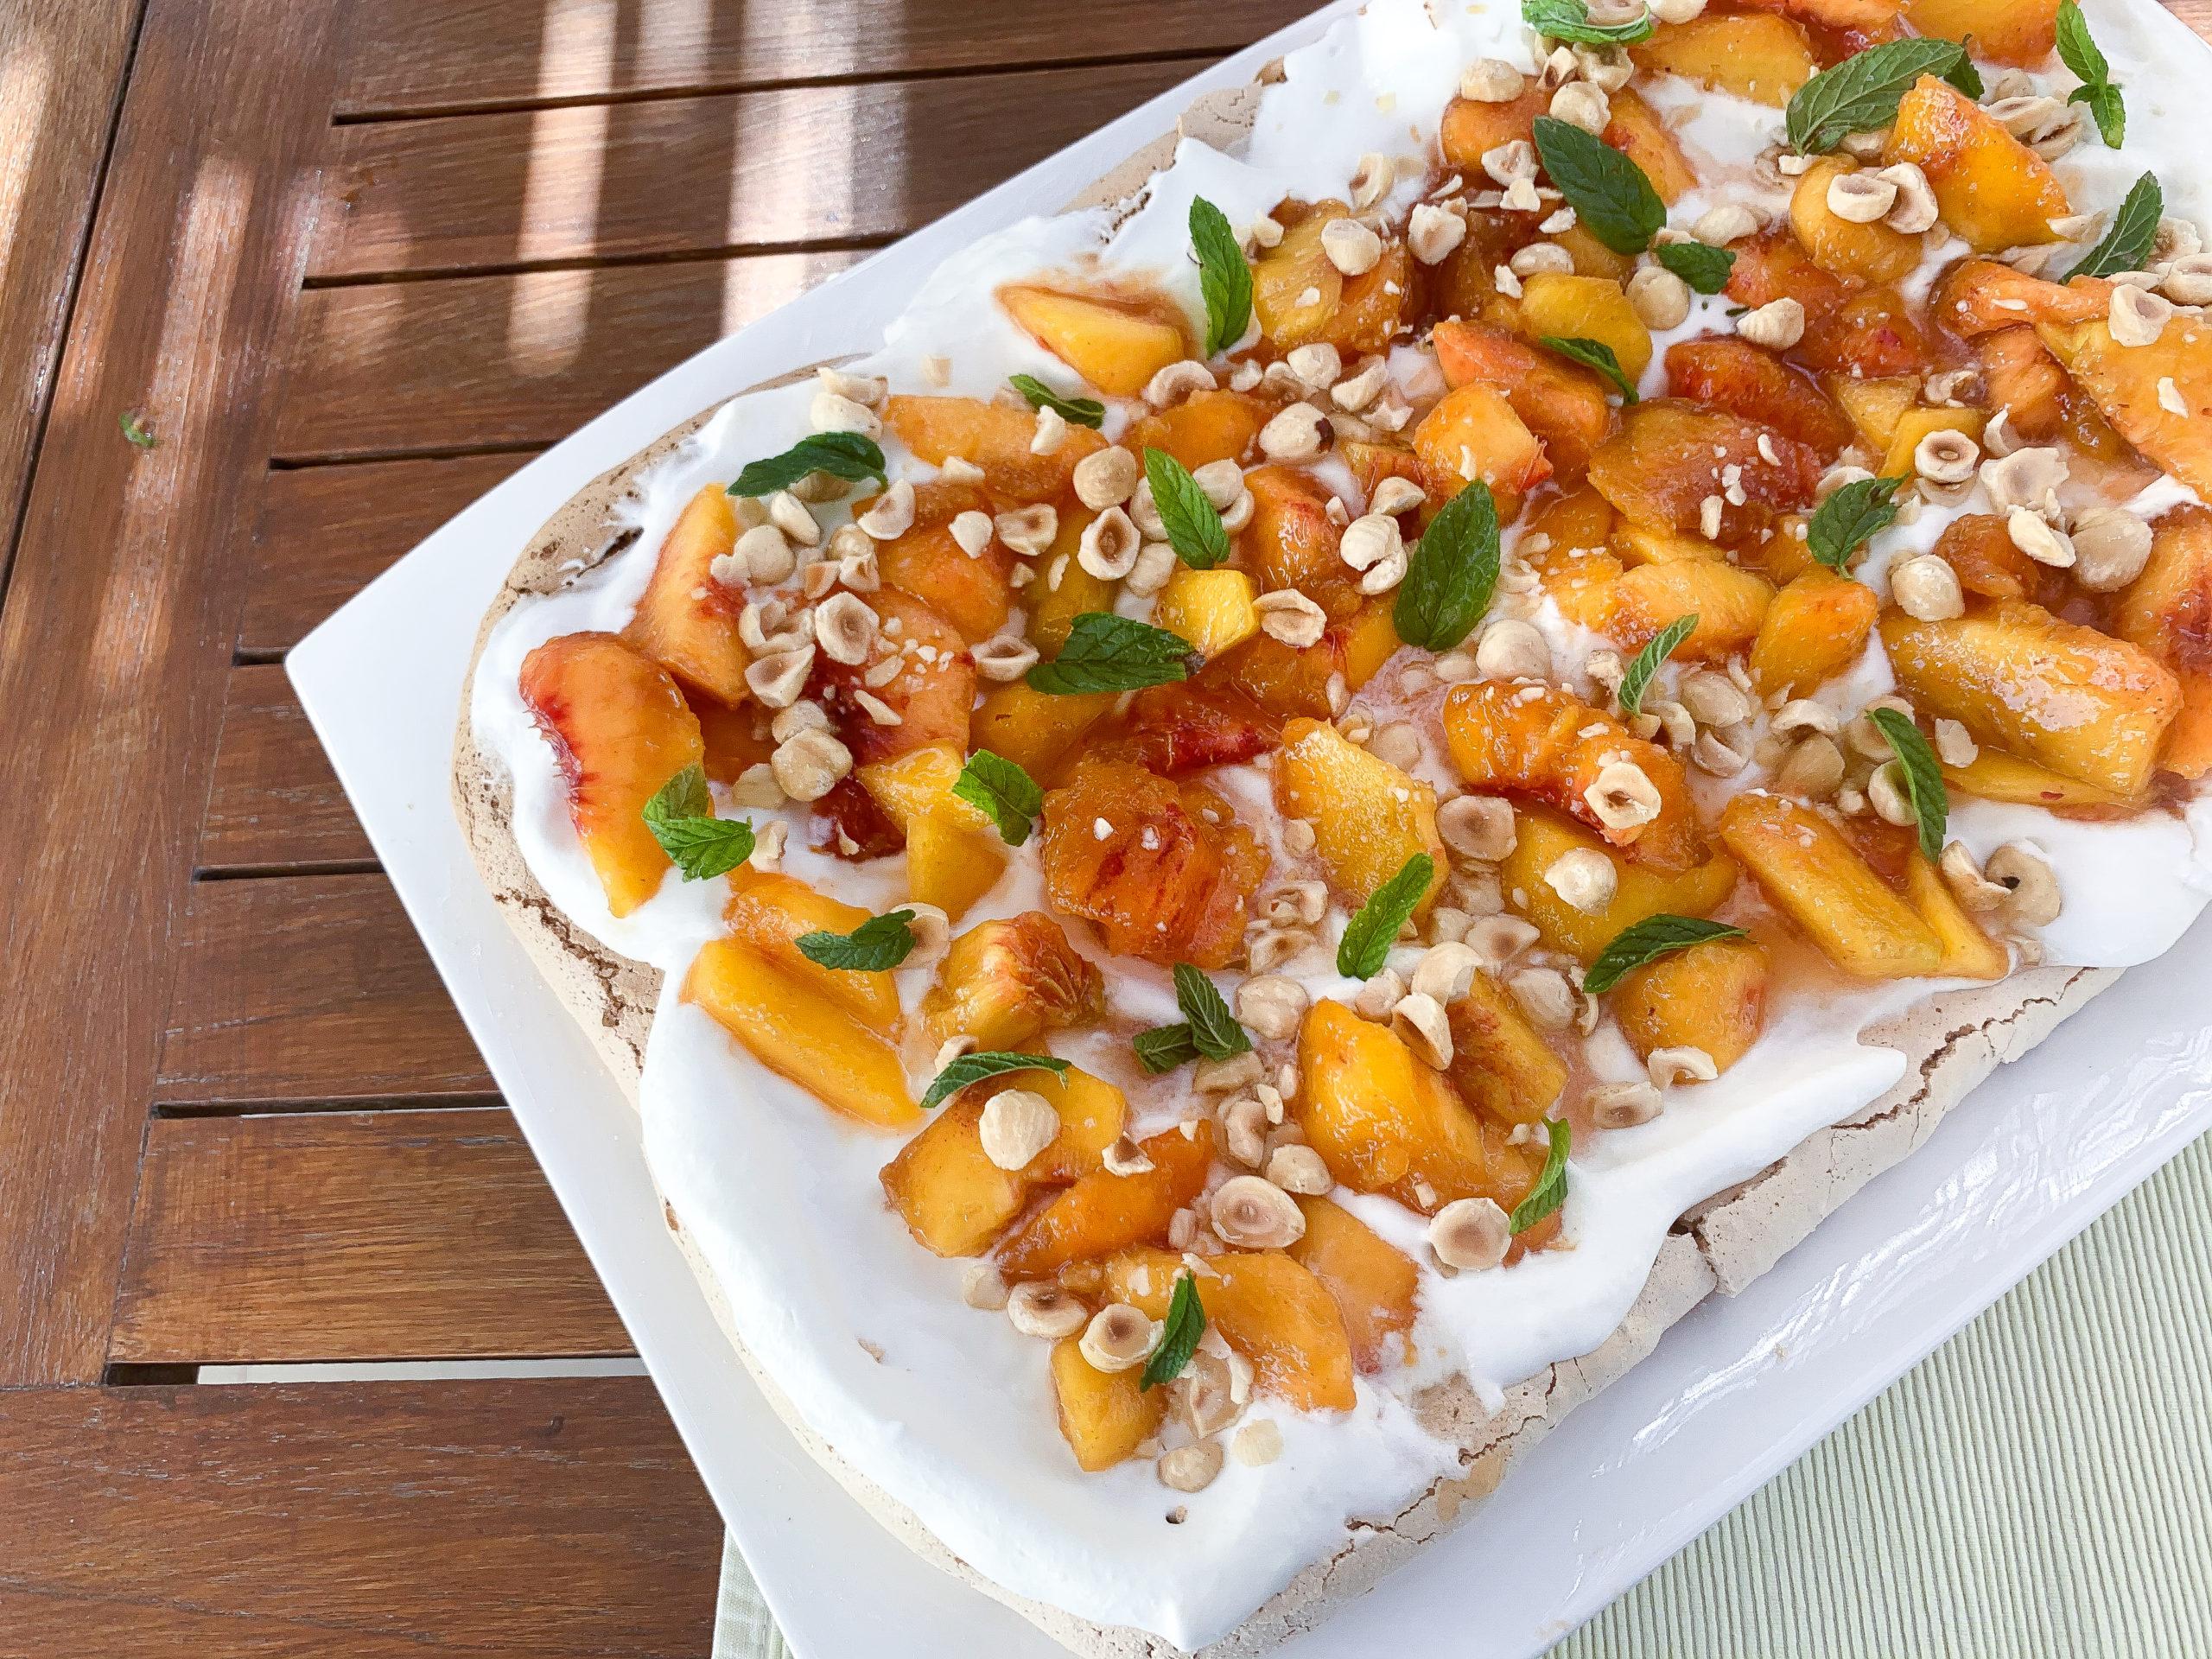 Summer pavlova with peaches and cream